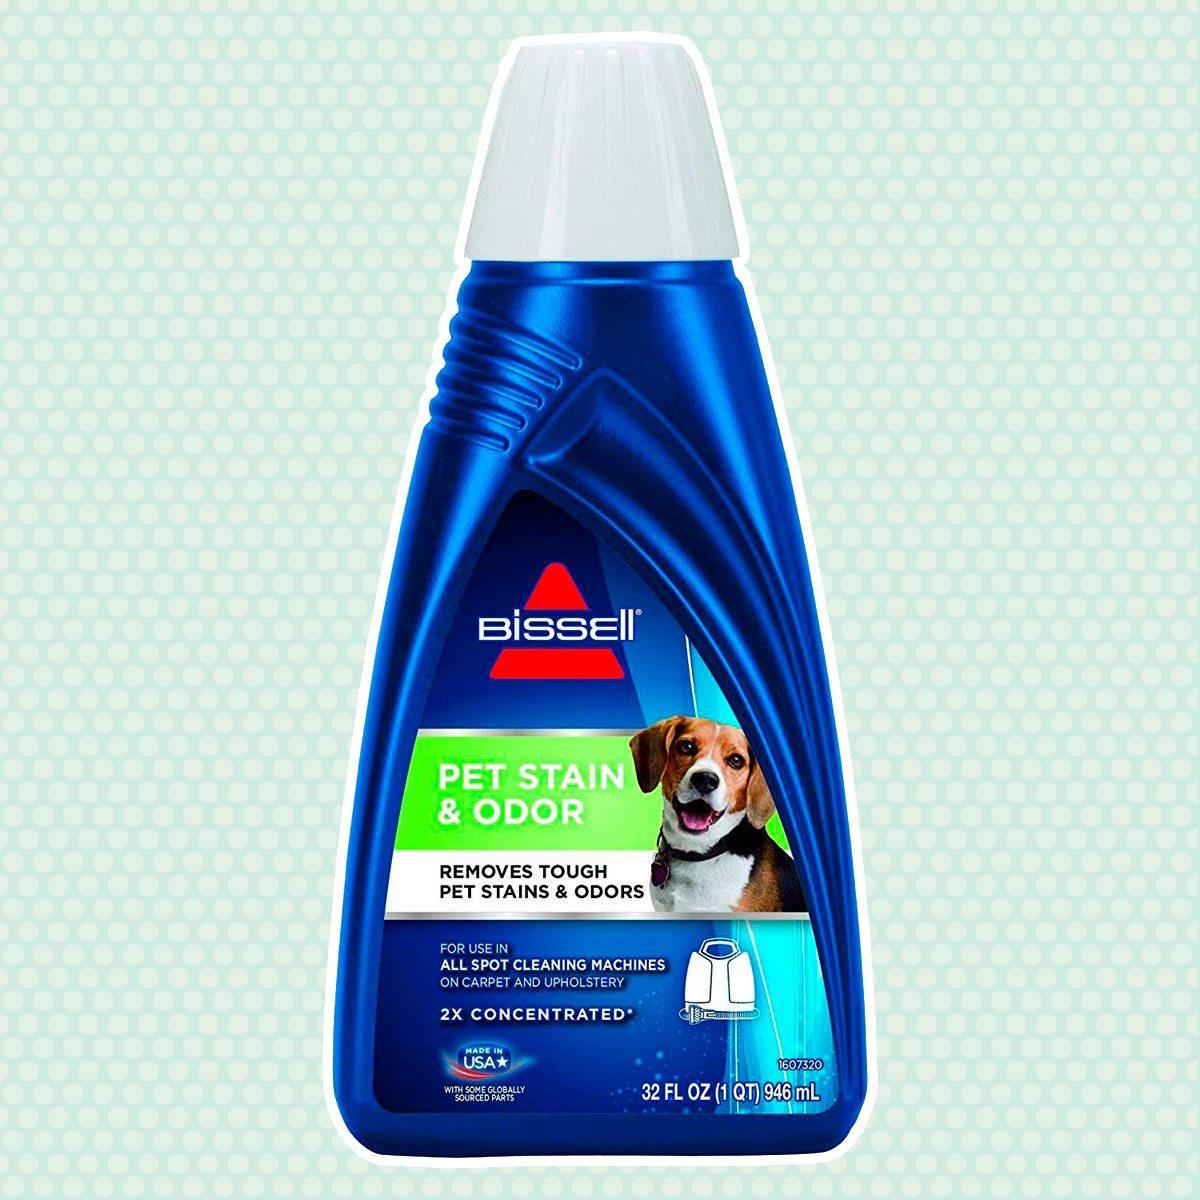 Bissel Pet Stain & Odor Remover